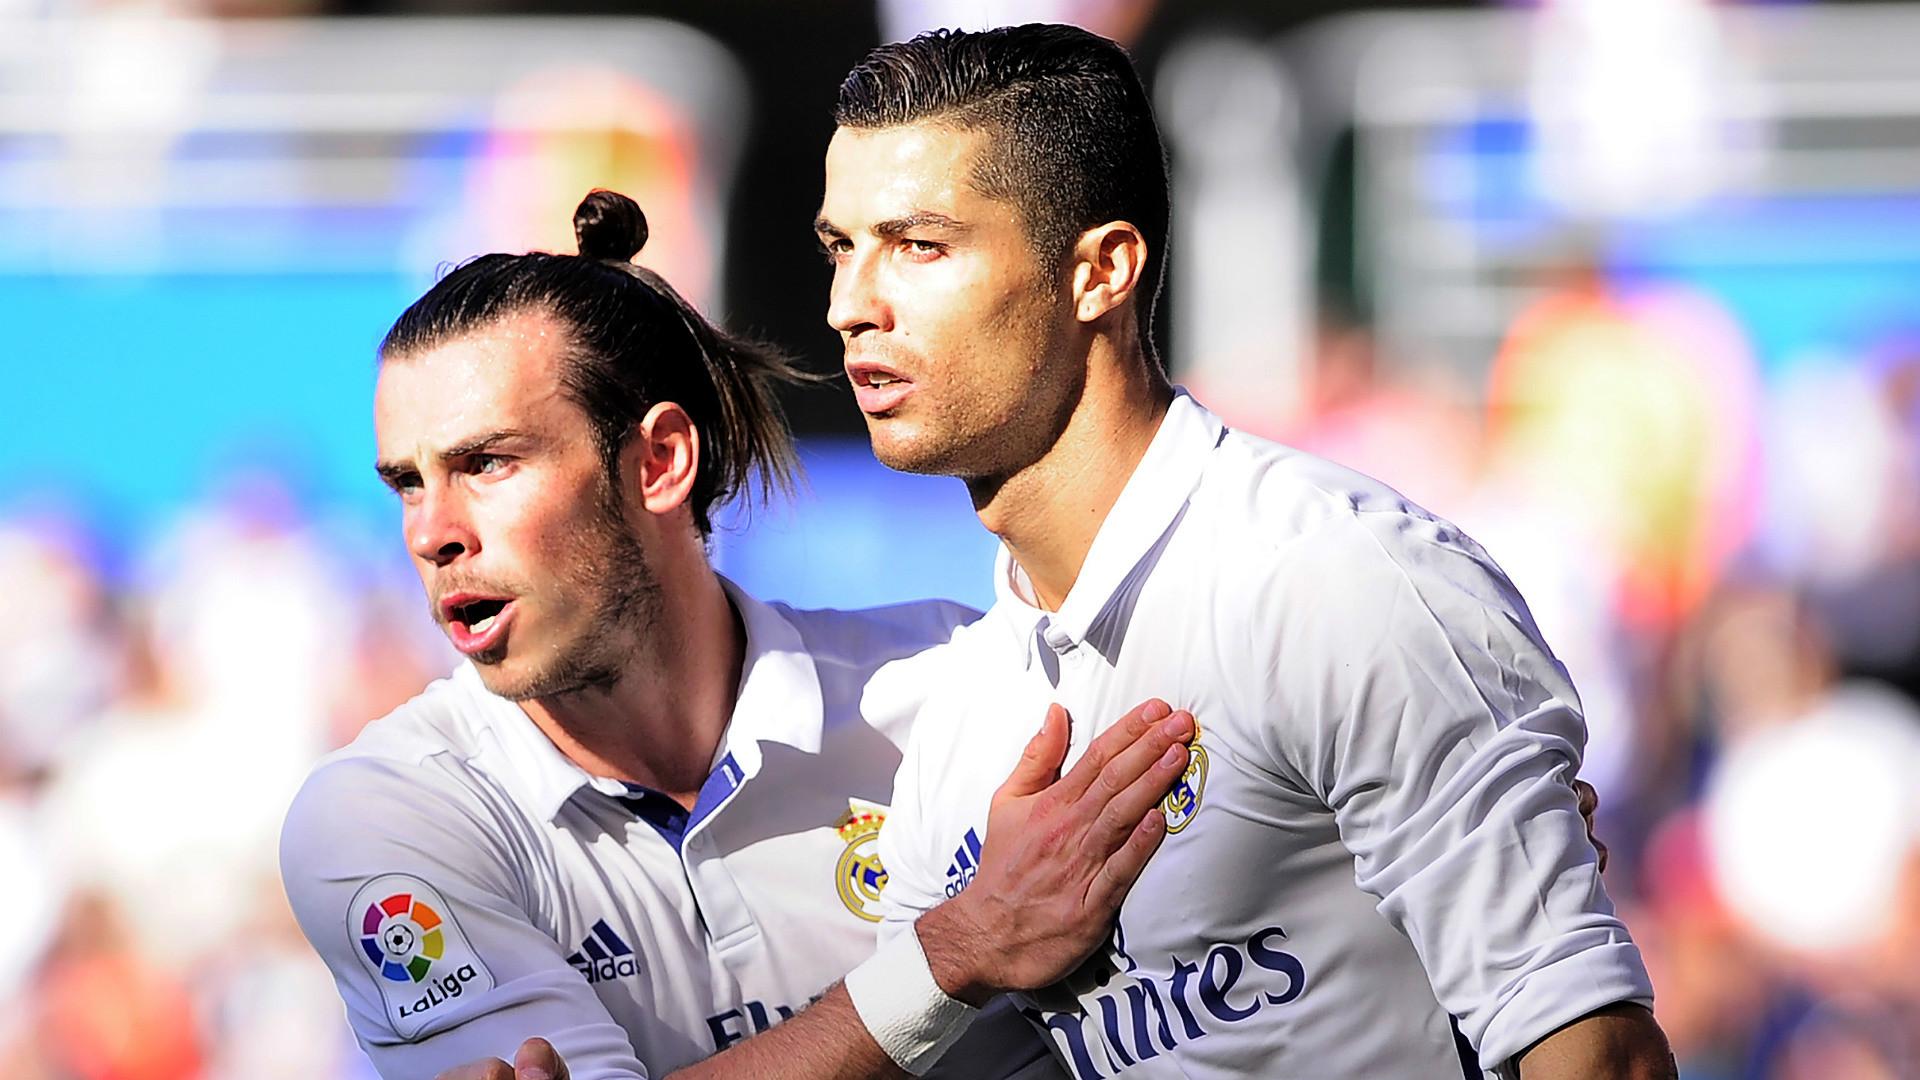 Gareth Bale Wallpaper 2018 HD (79+ images)